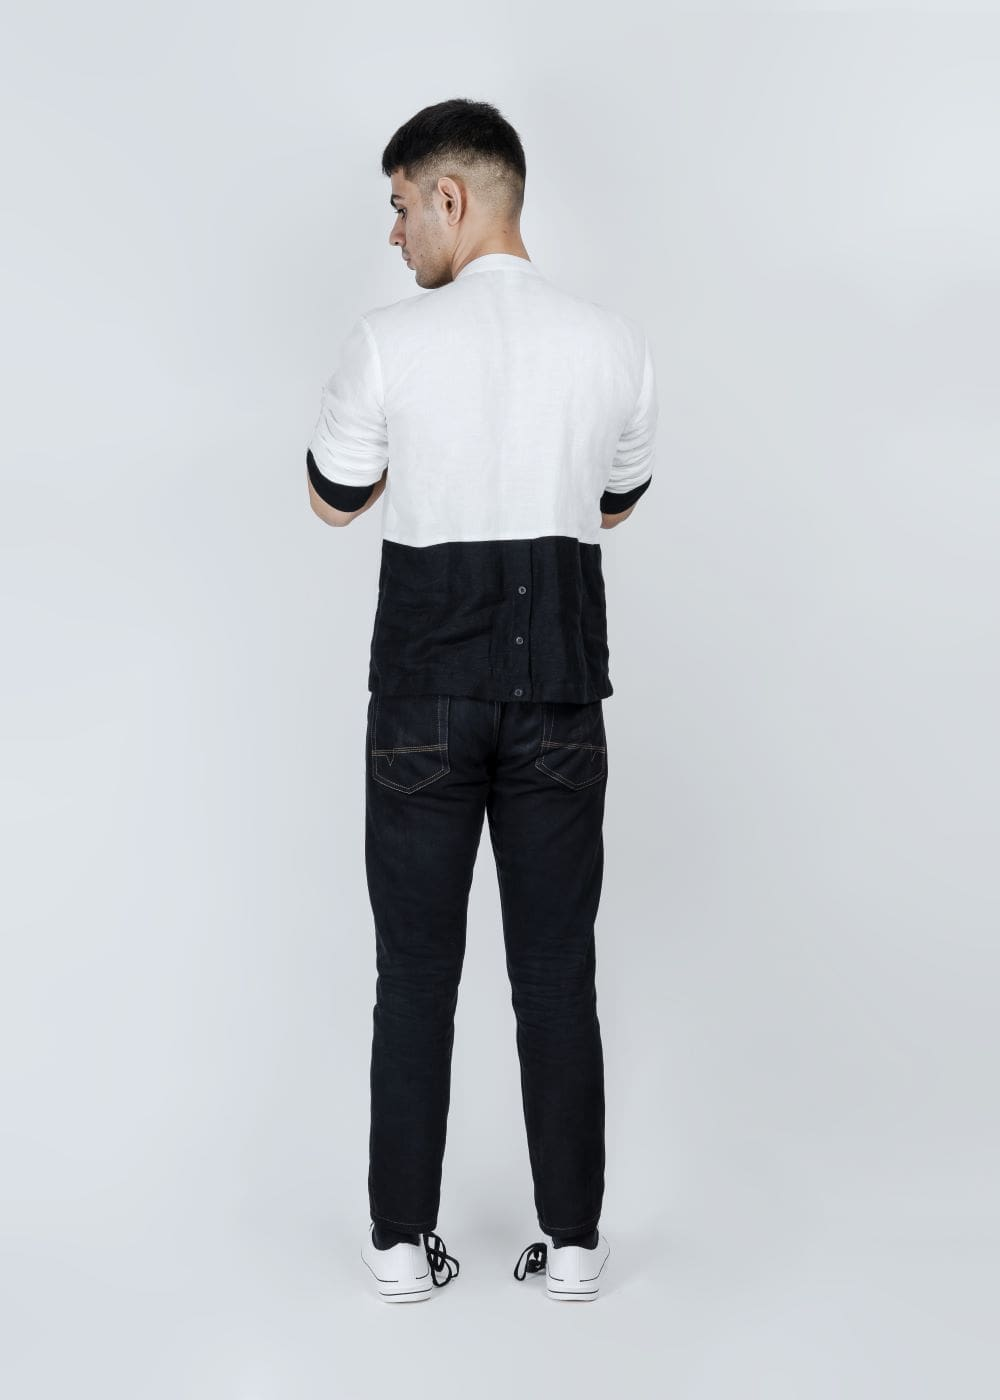 @STOREAT44   Best Black&White Clothing Brand   5